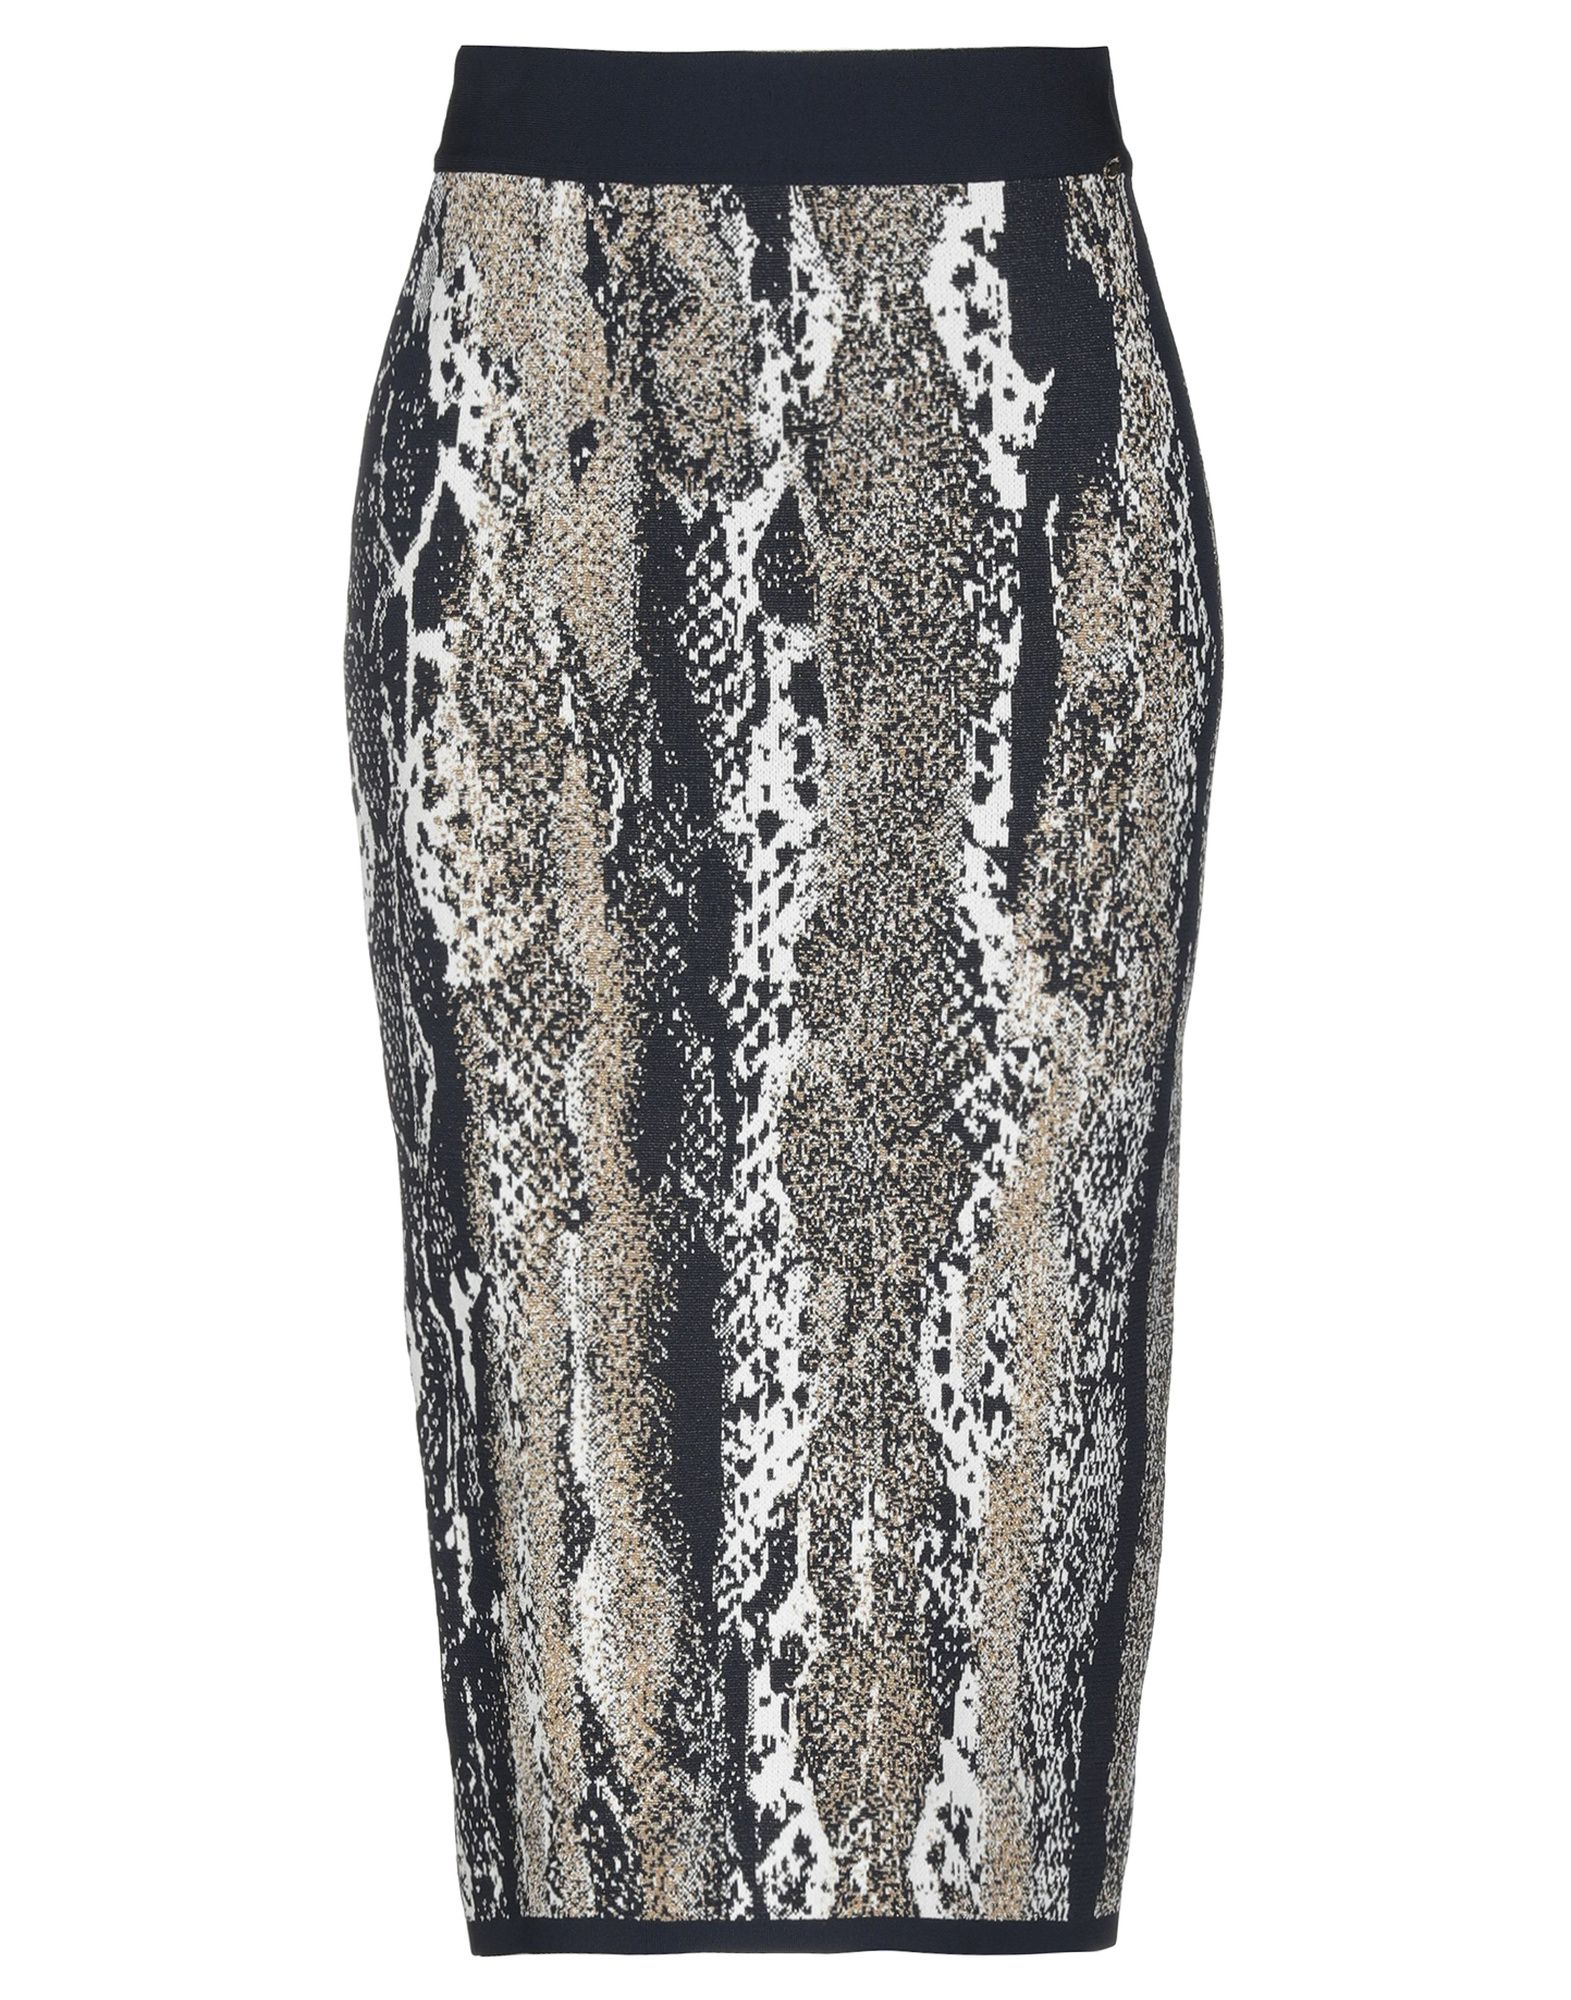 ANGELO MARANI Юбка длиной 3/4 printio юбка карандаш укороченная